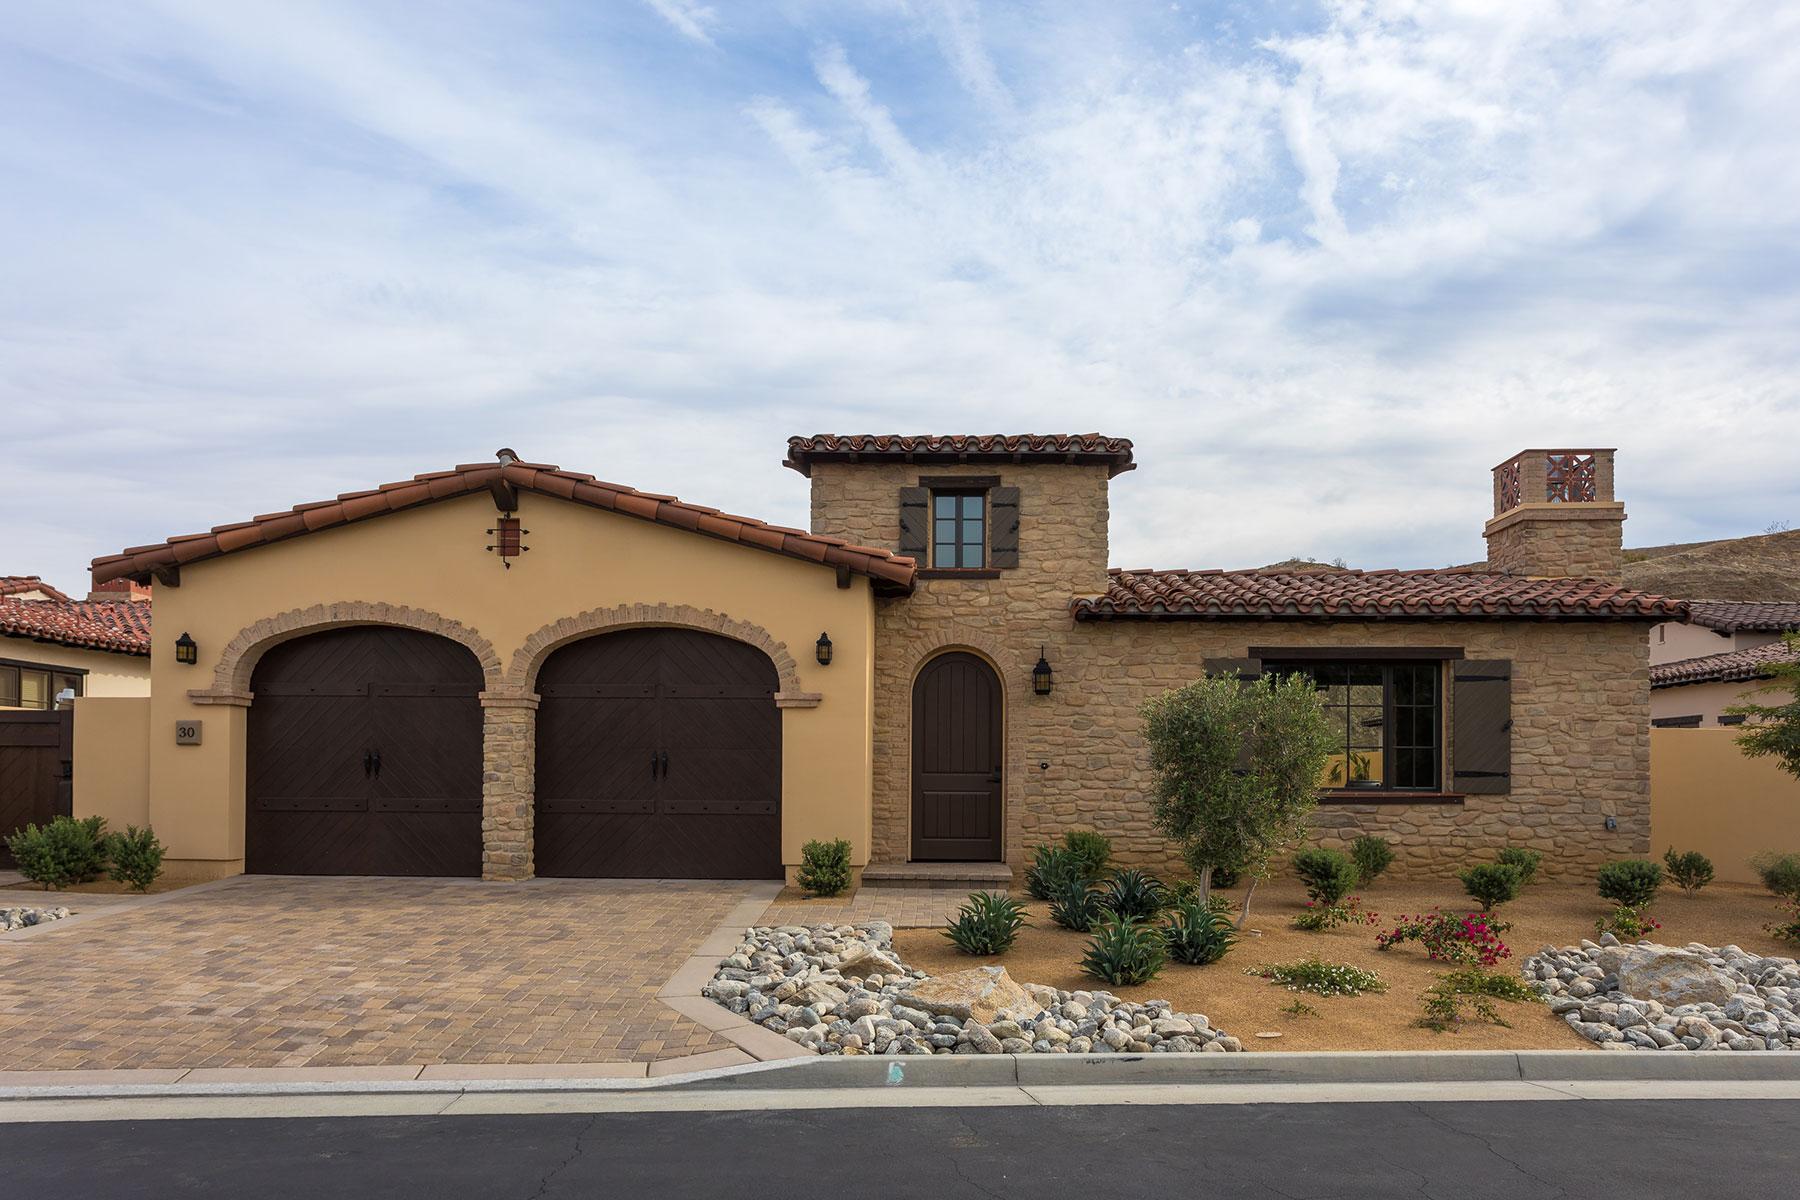 Single Family Home for Sale at 30 Santa Rosa Mountain Rancho Mirage, California 92270 United States